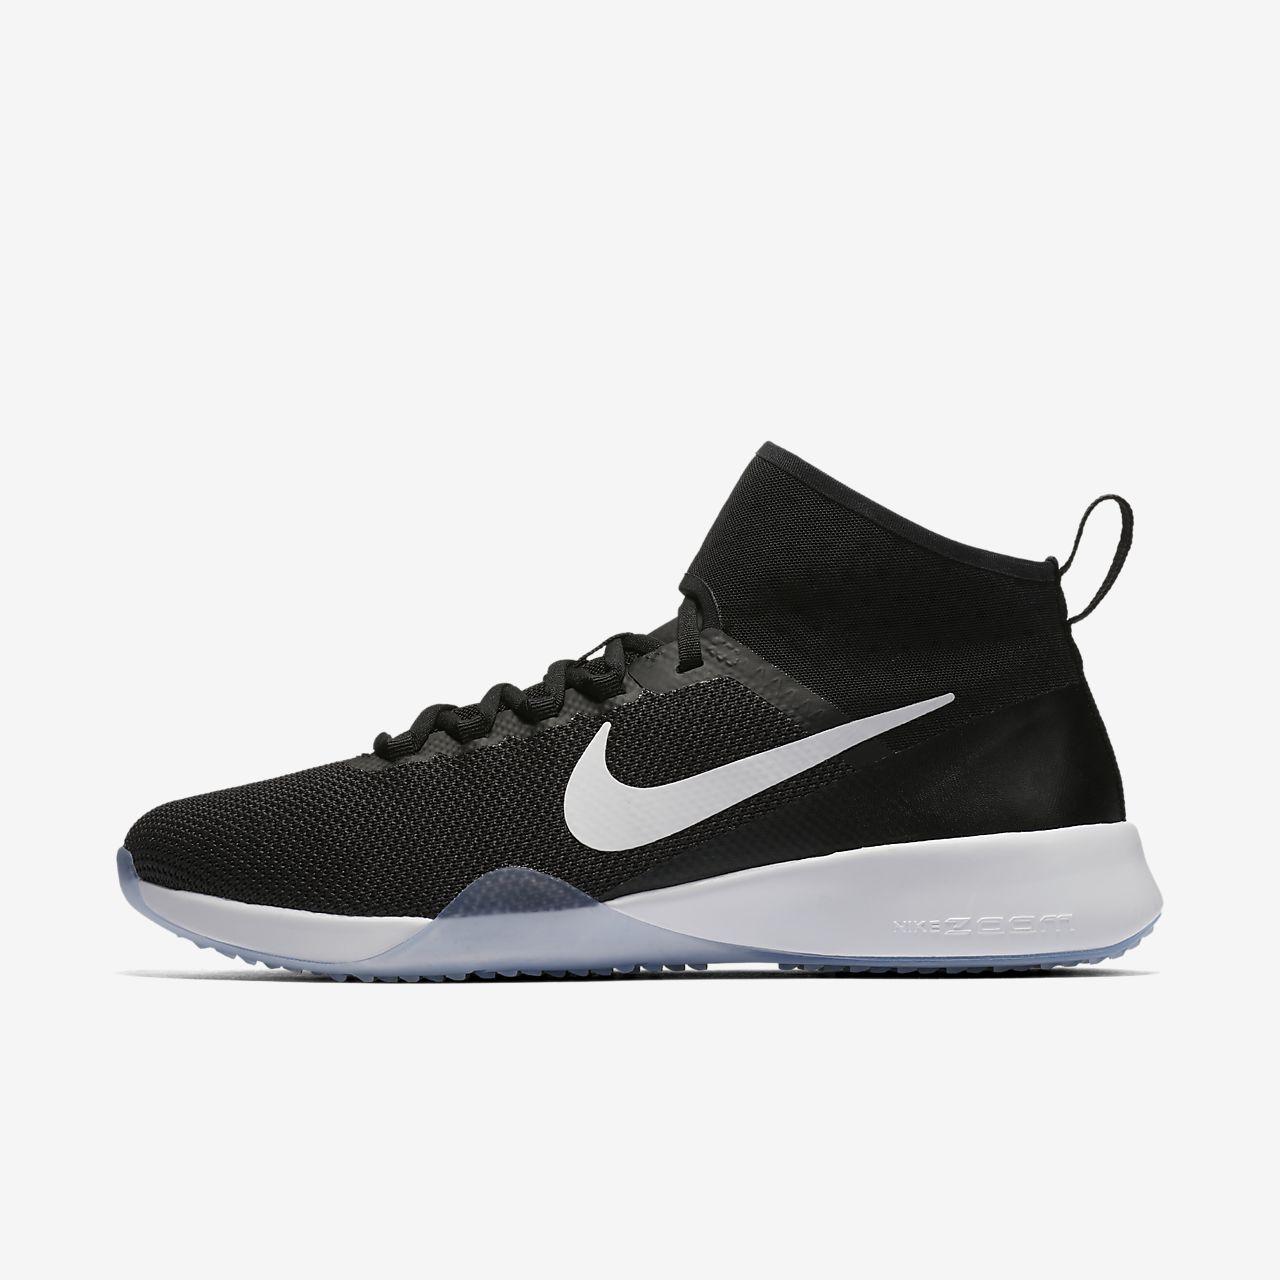 Wmns Nike Gym Zoom Air - Chaussures Pour Femmes / Noir Nike wMo6G2m